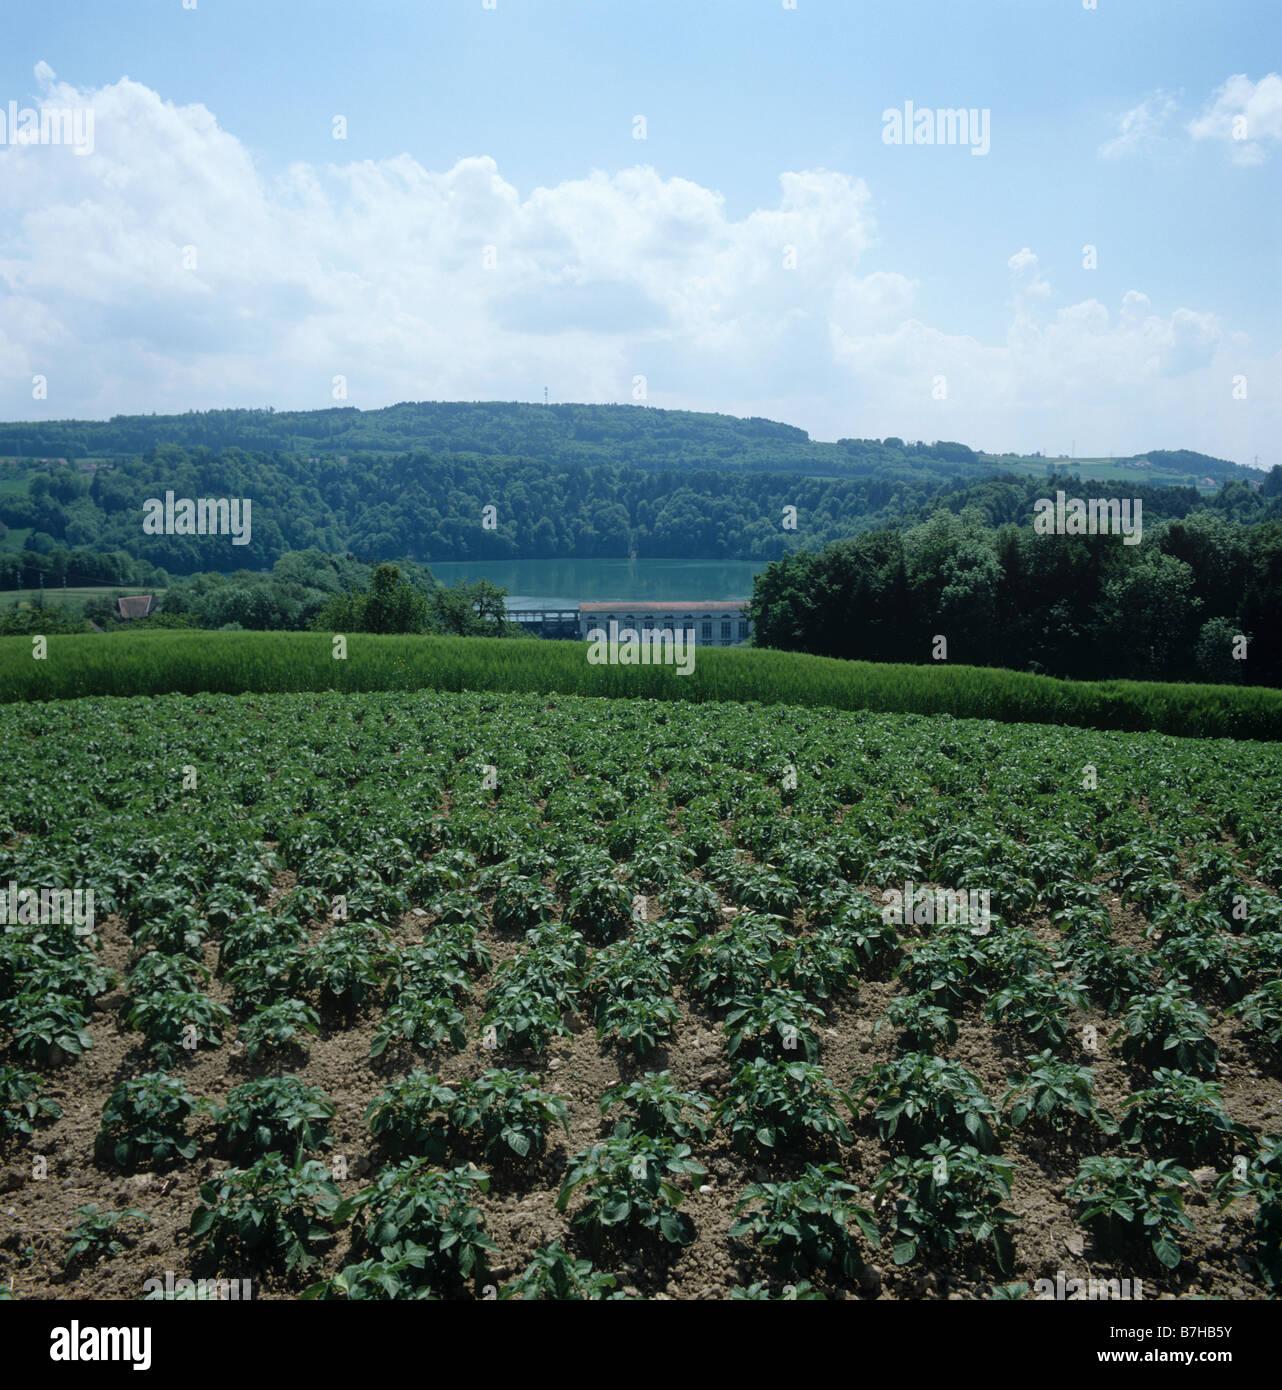 Young potato crop in farmland around a lake Switzerland - Stock Image